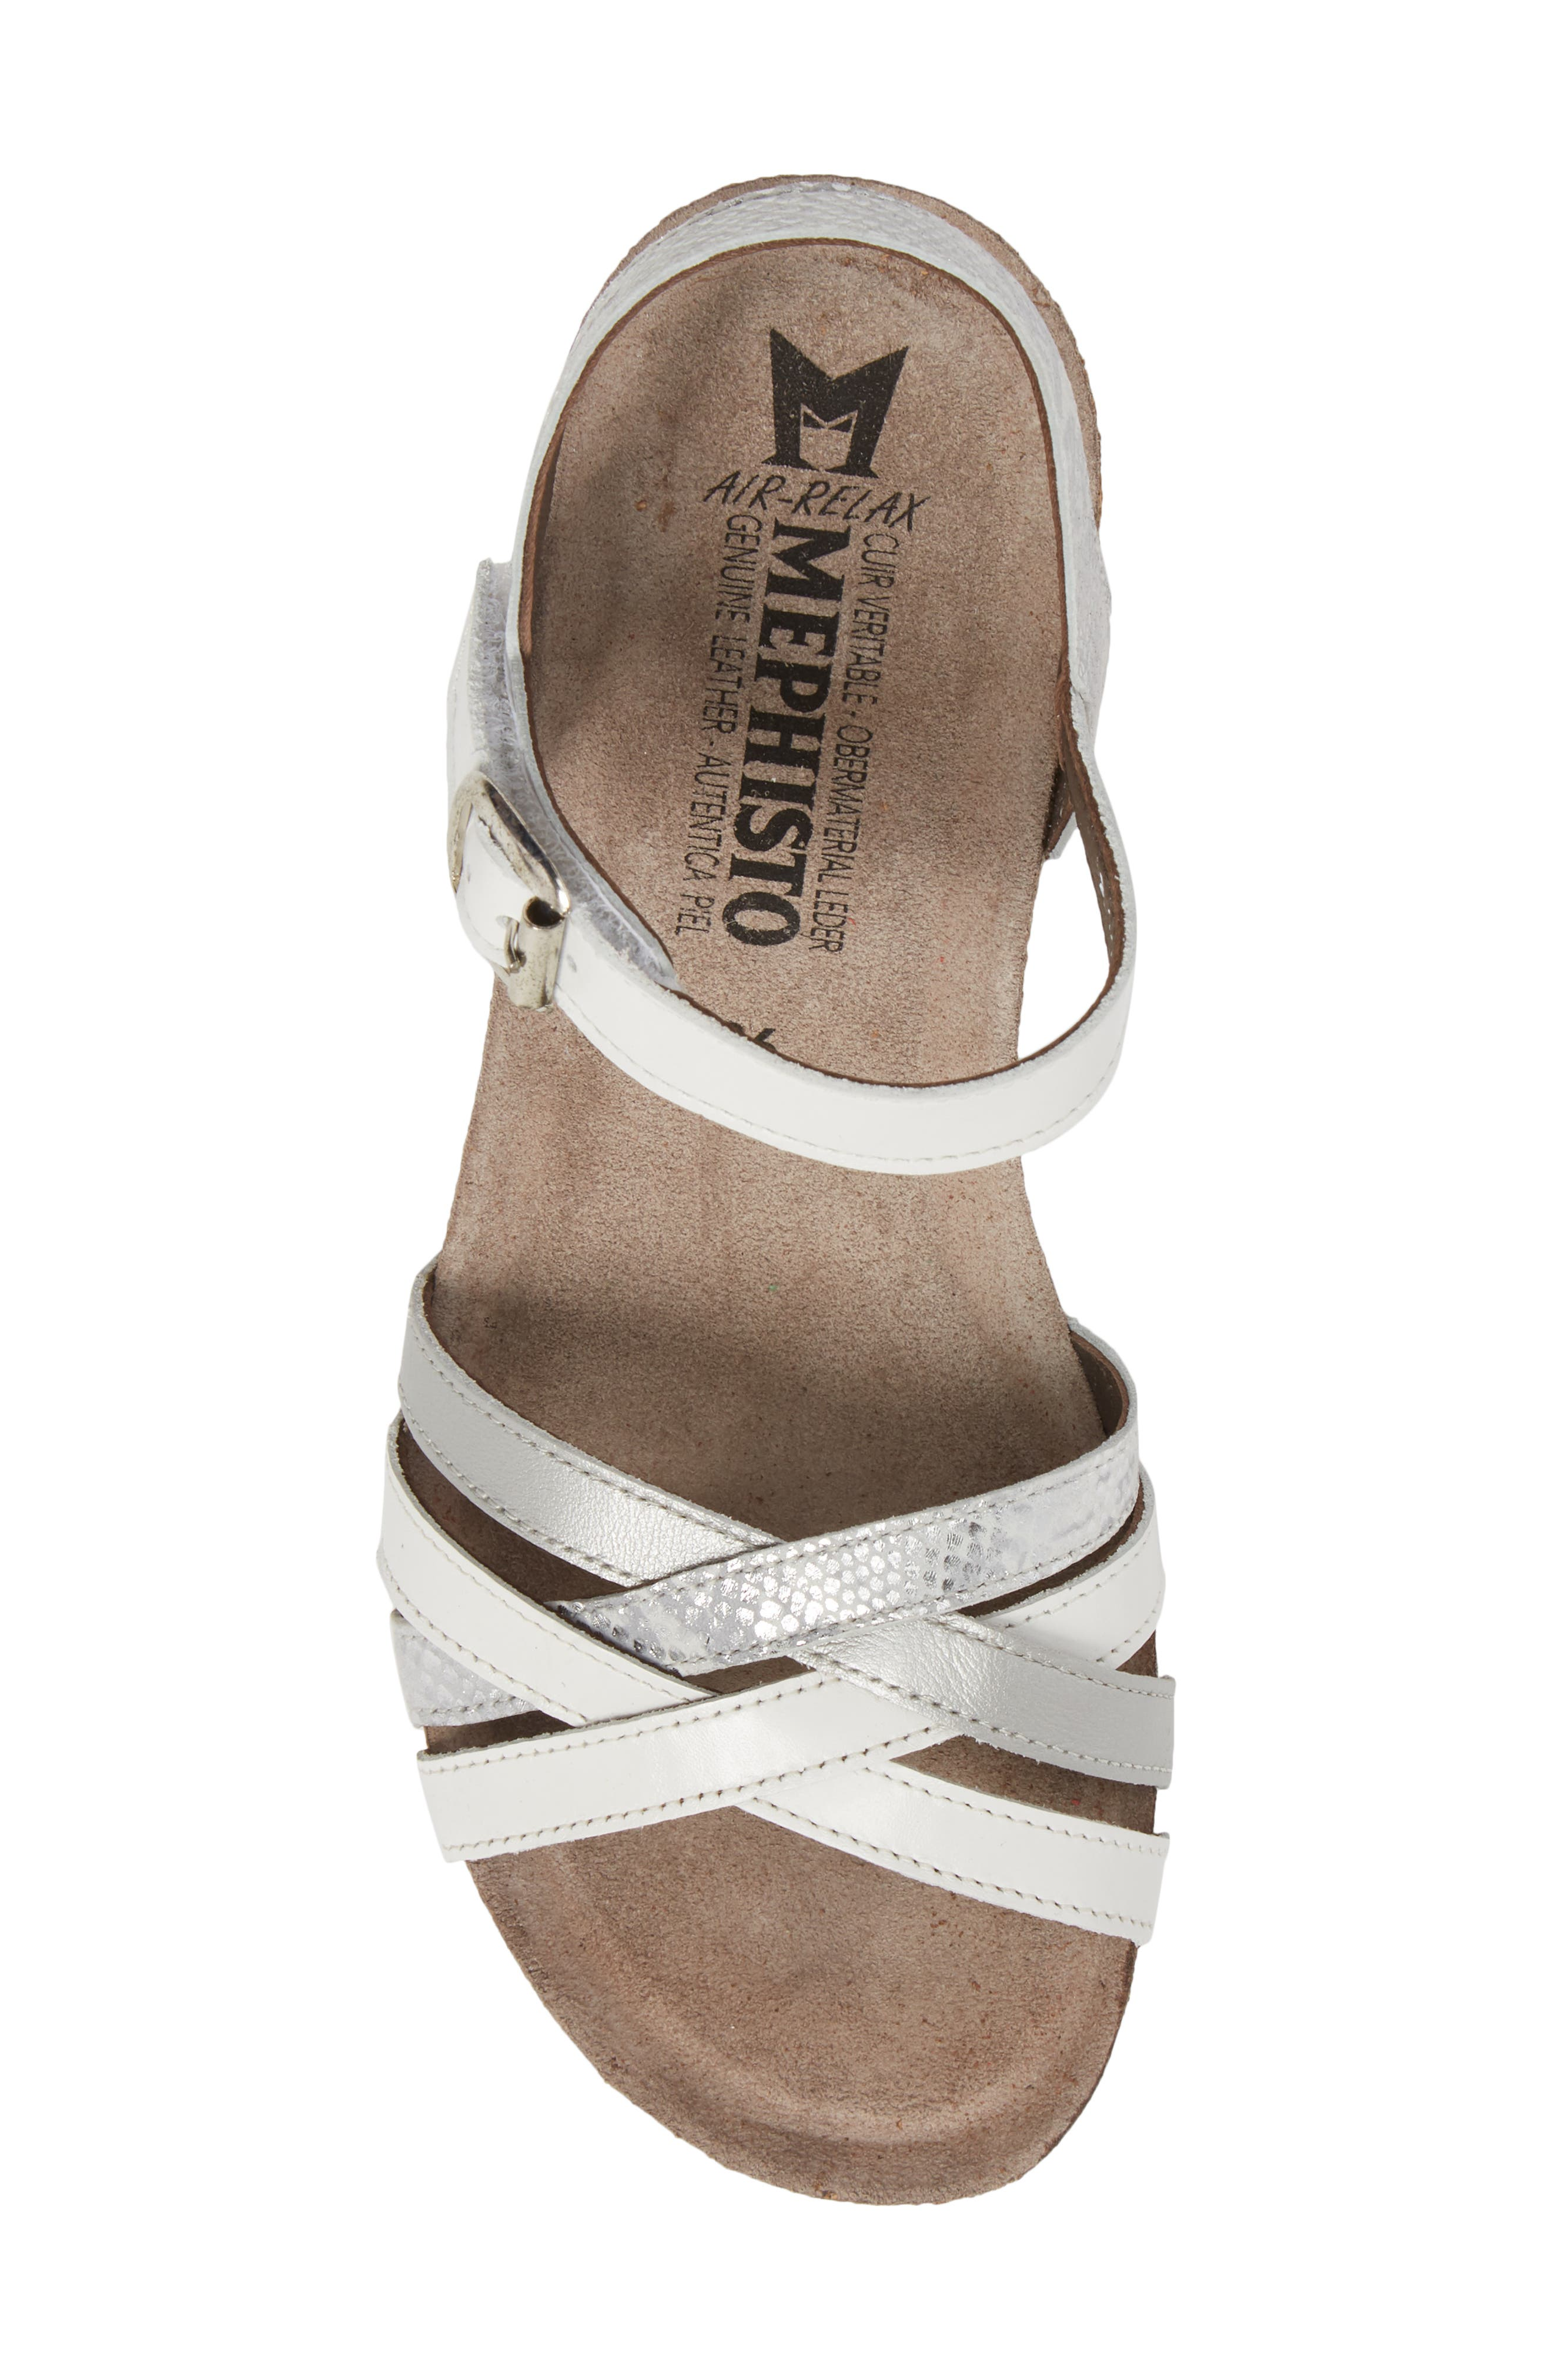 Mado Wedge Sandal,                             Alternate thumbnail 5, color,                             White Leather